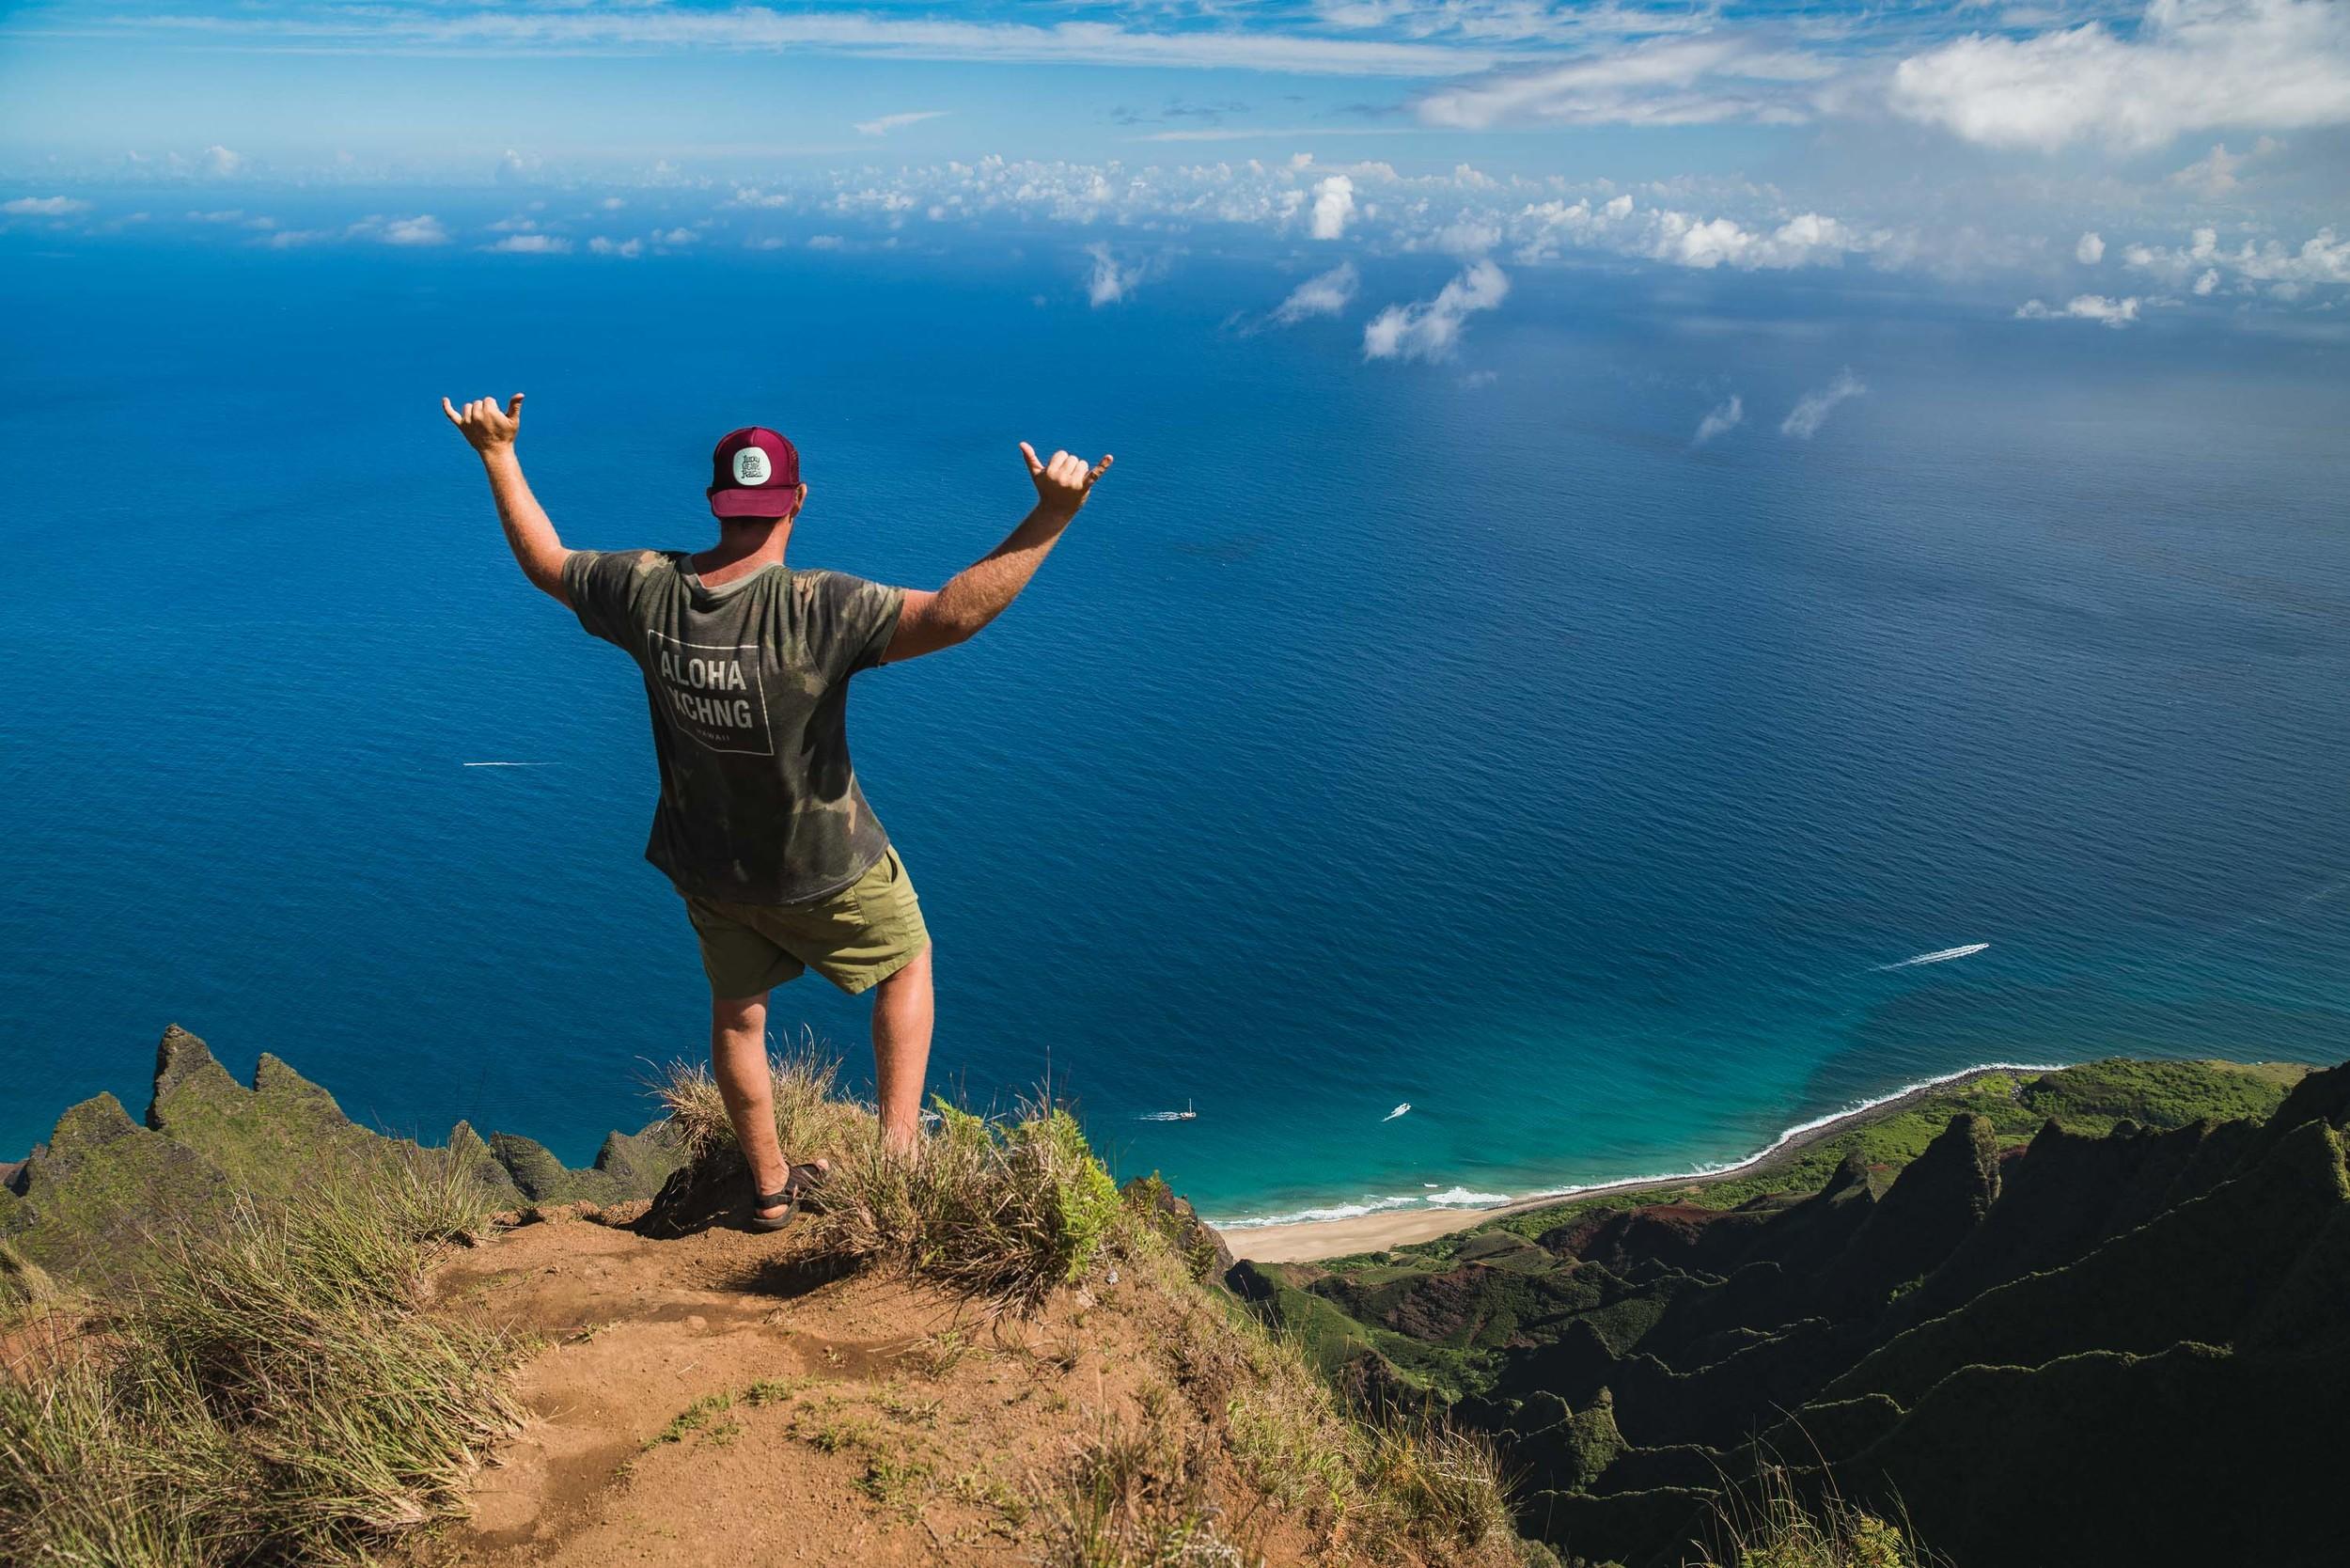 bryce-johnson-kalalau-ridge-kauai-hiking-hammock-palmwood-aloha-exchange-14.jpg